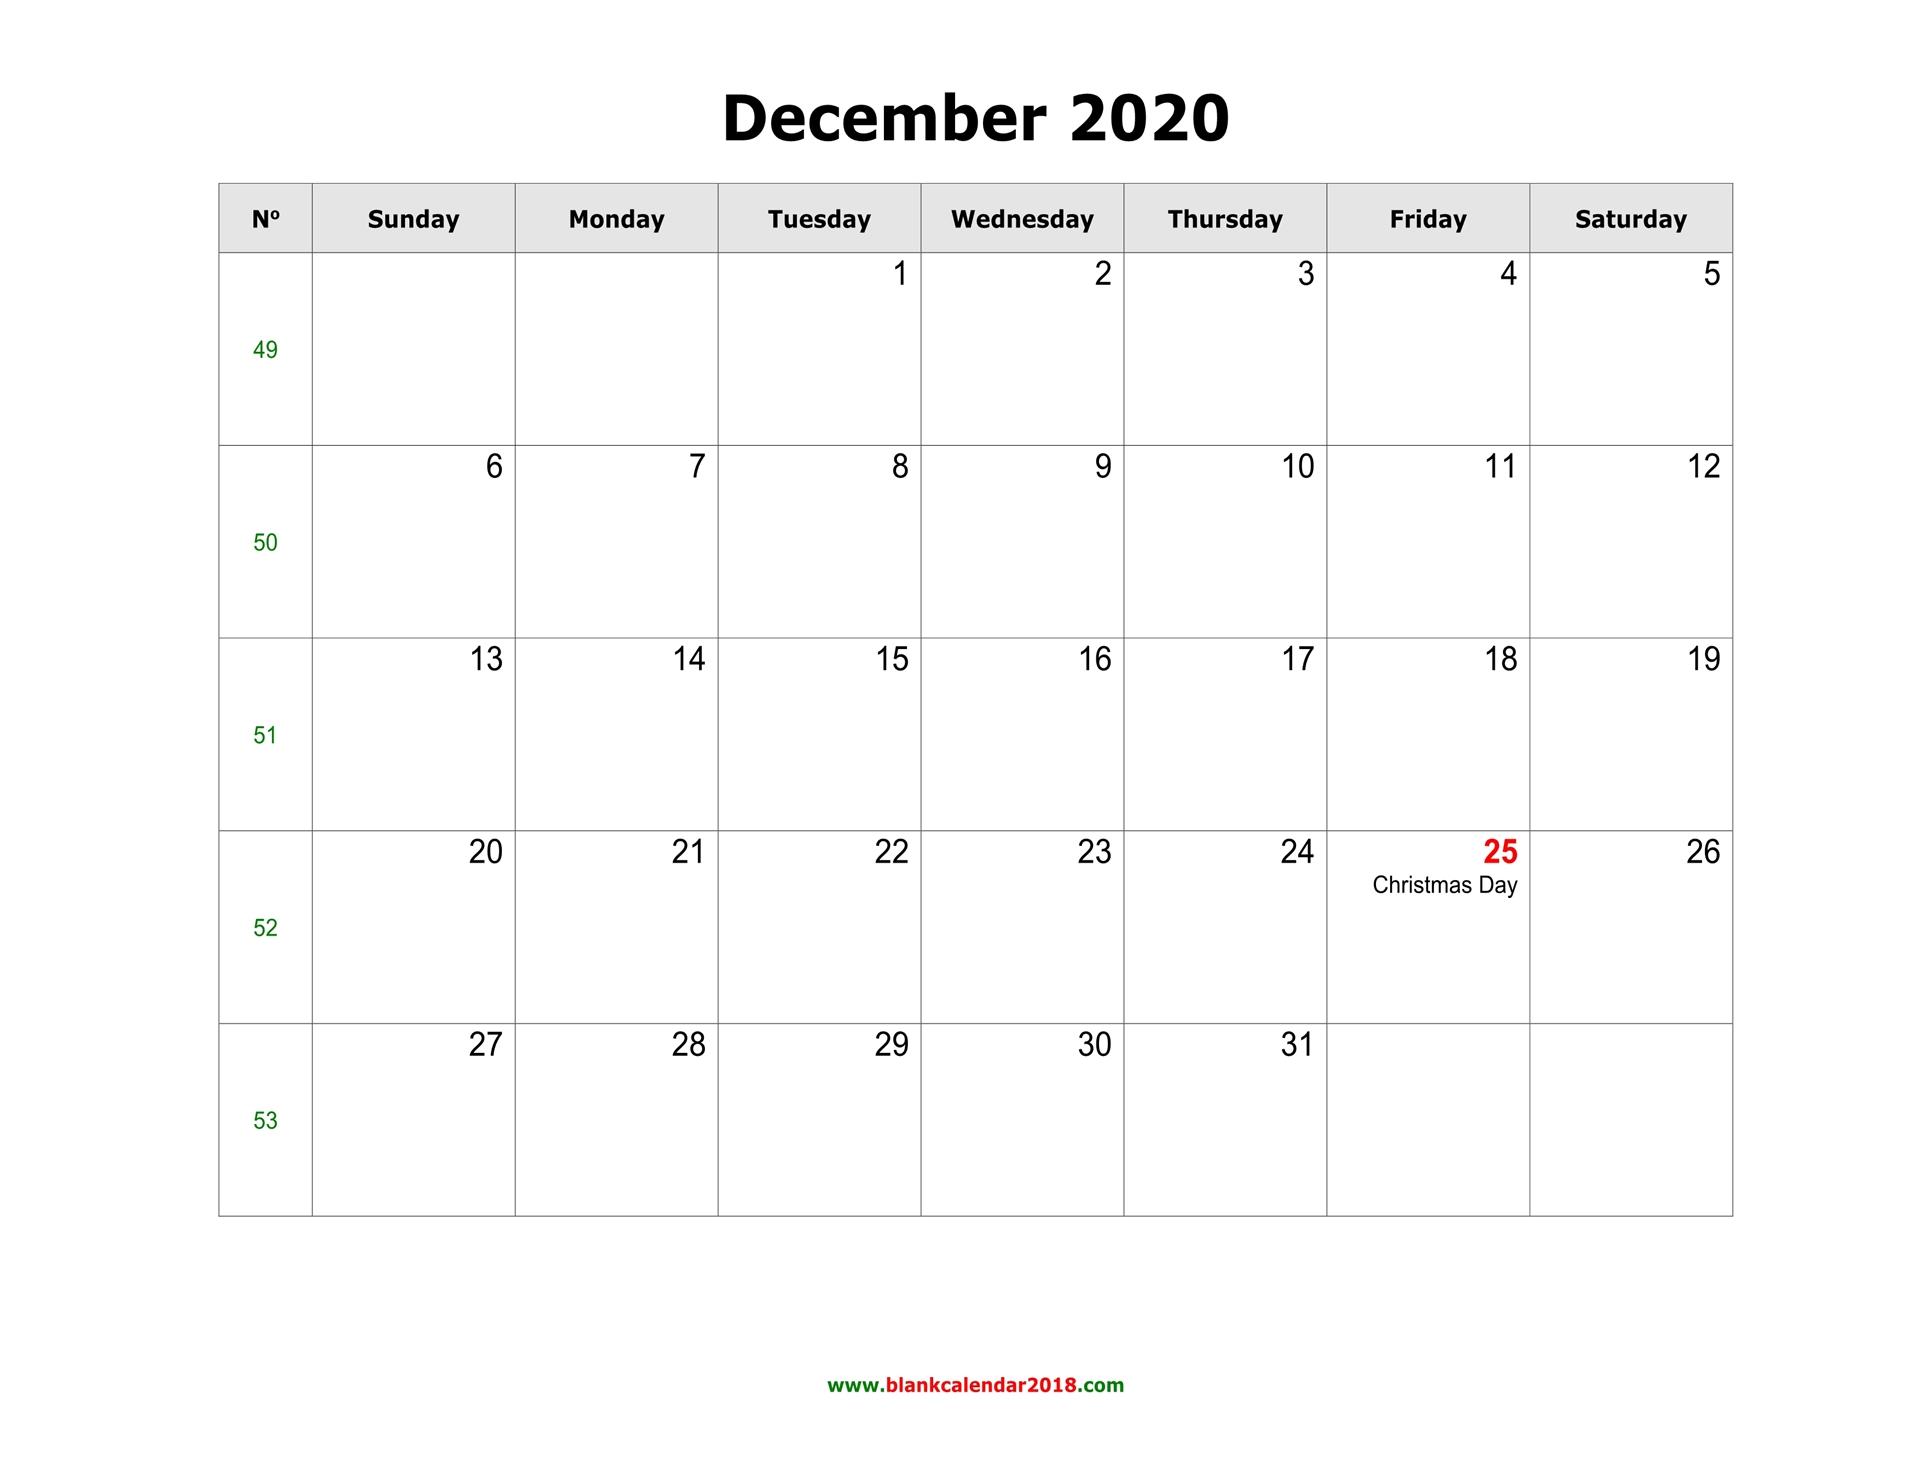 Blank Calendar For December 2020 in Calendar November December January Space To Write At The Side